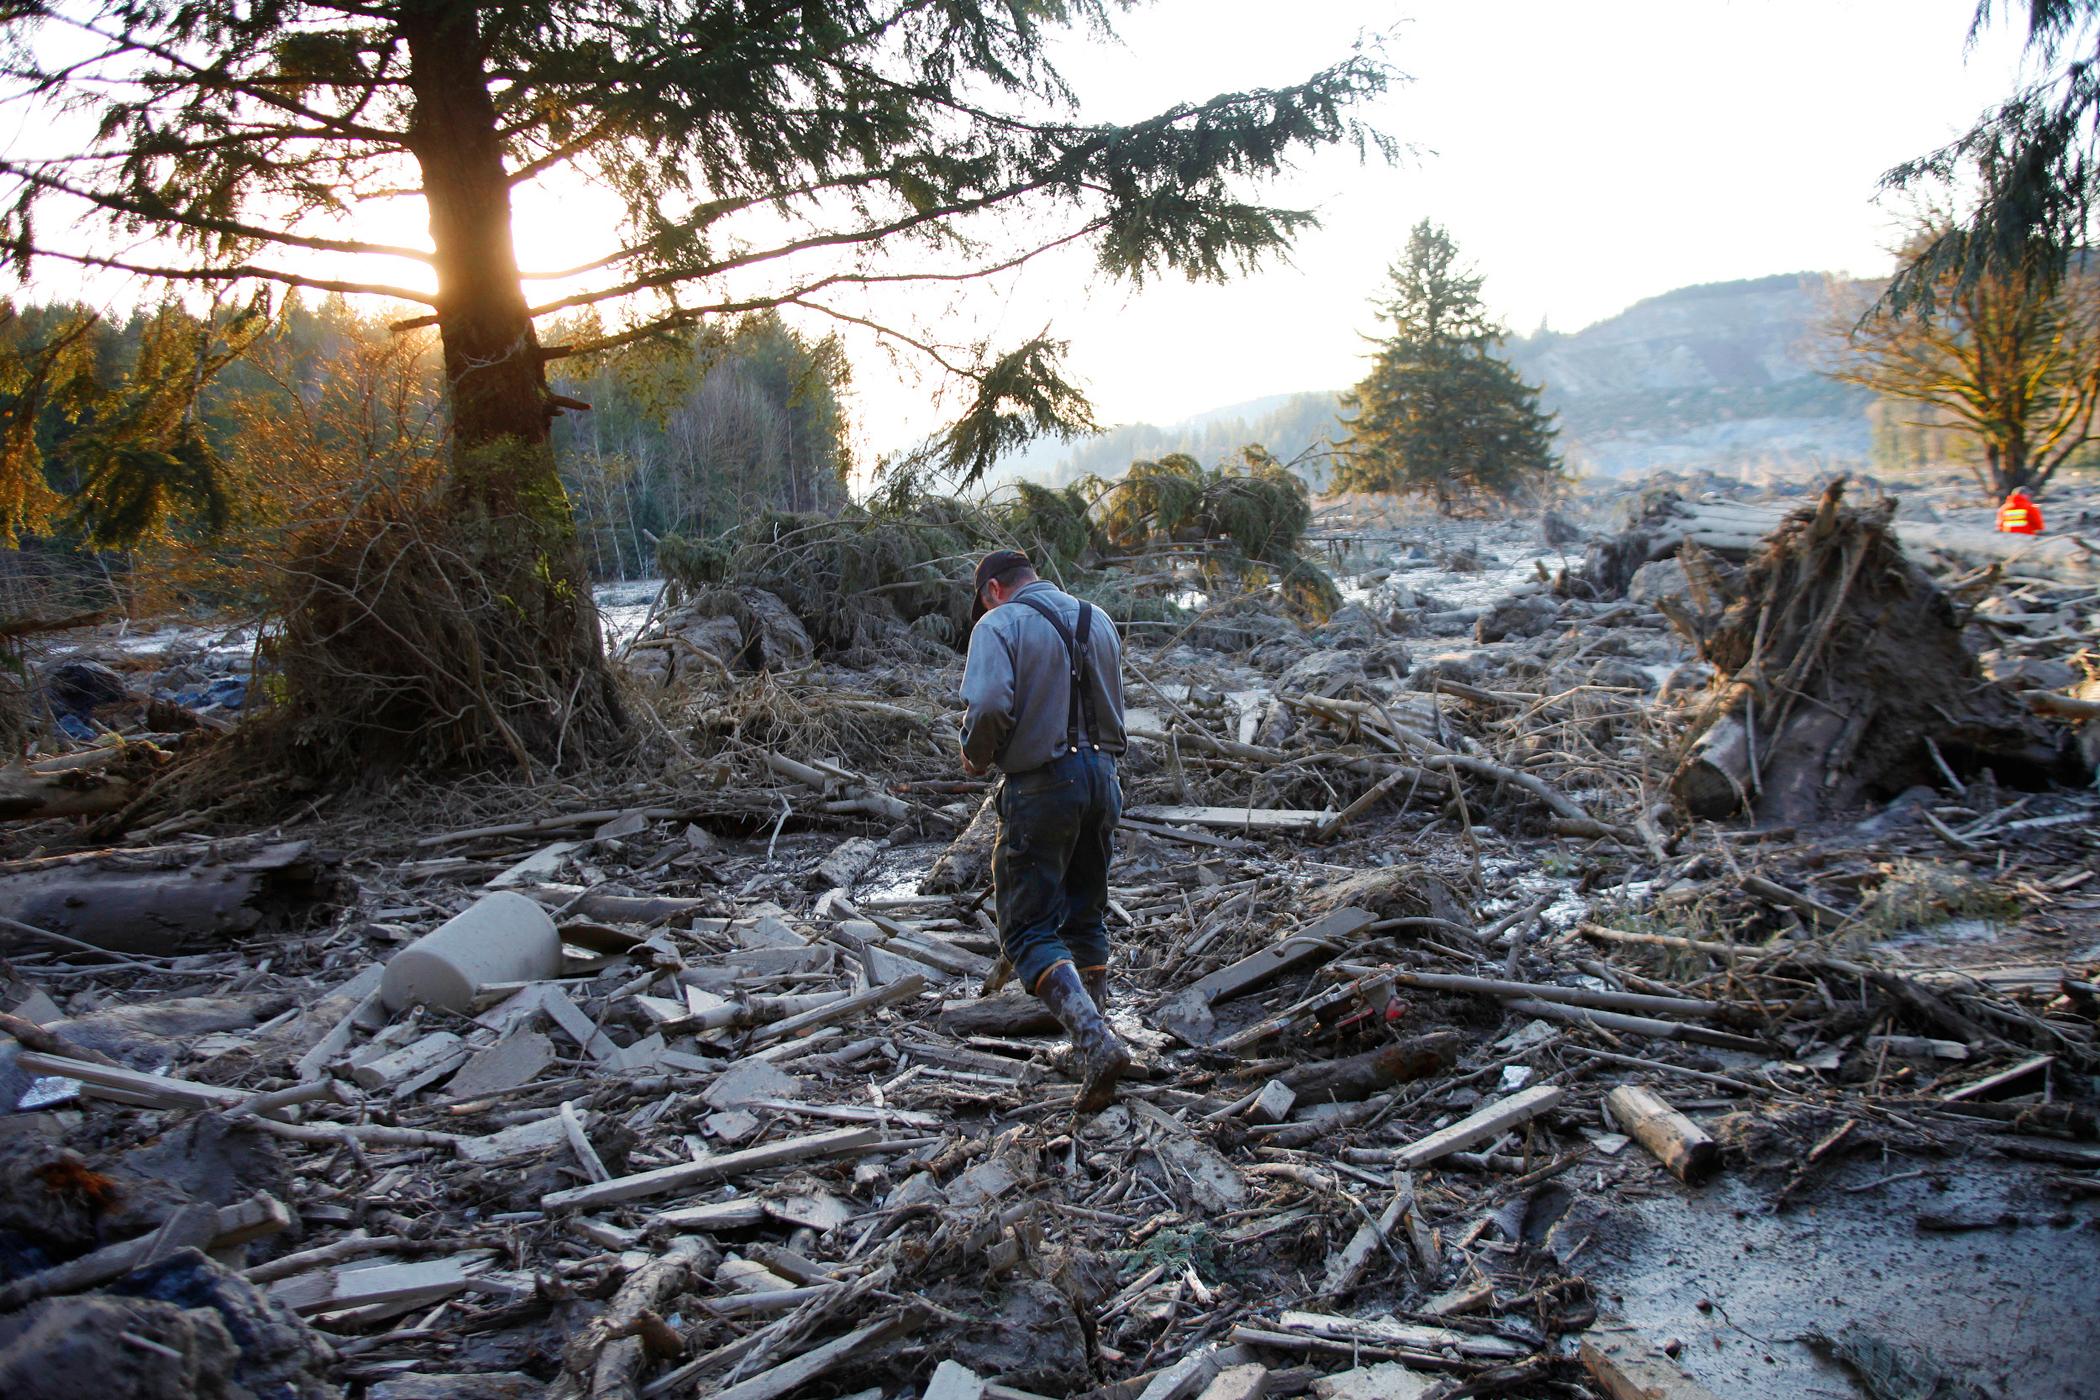 Steve Skaglund walks across the rubble on the east side of Saturday's fatal mudslide near Oso, Wash., Sunday, March 23, 2014.